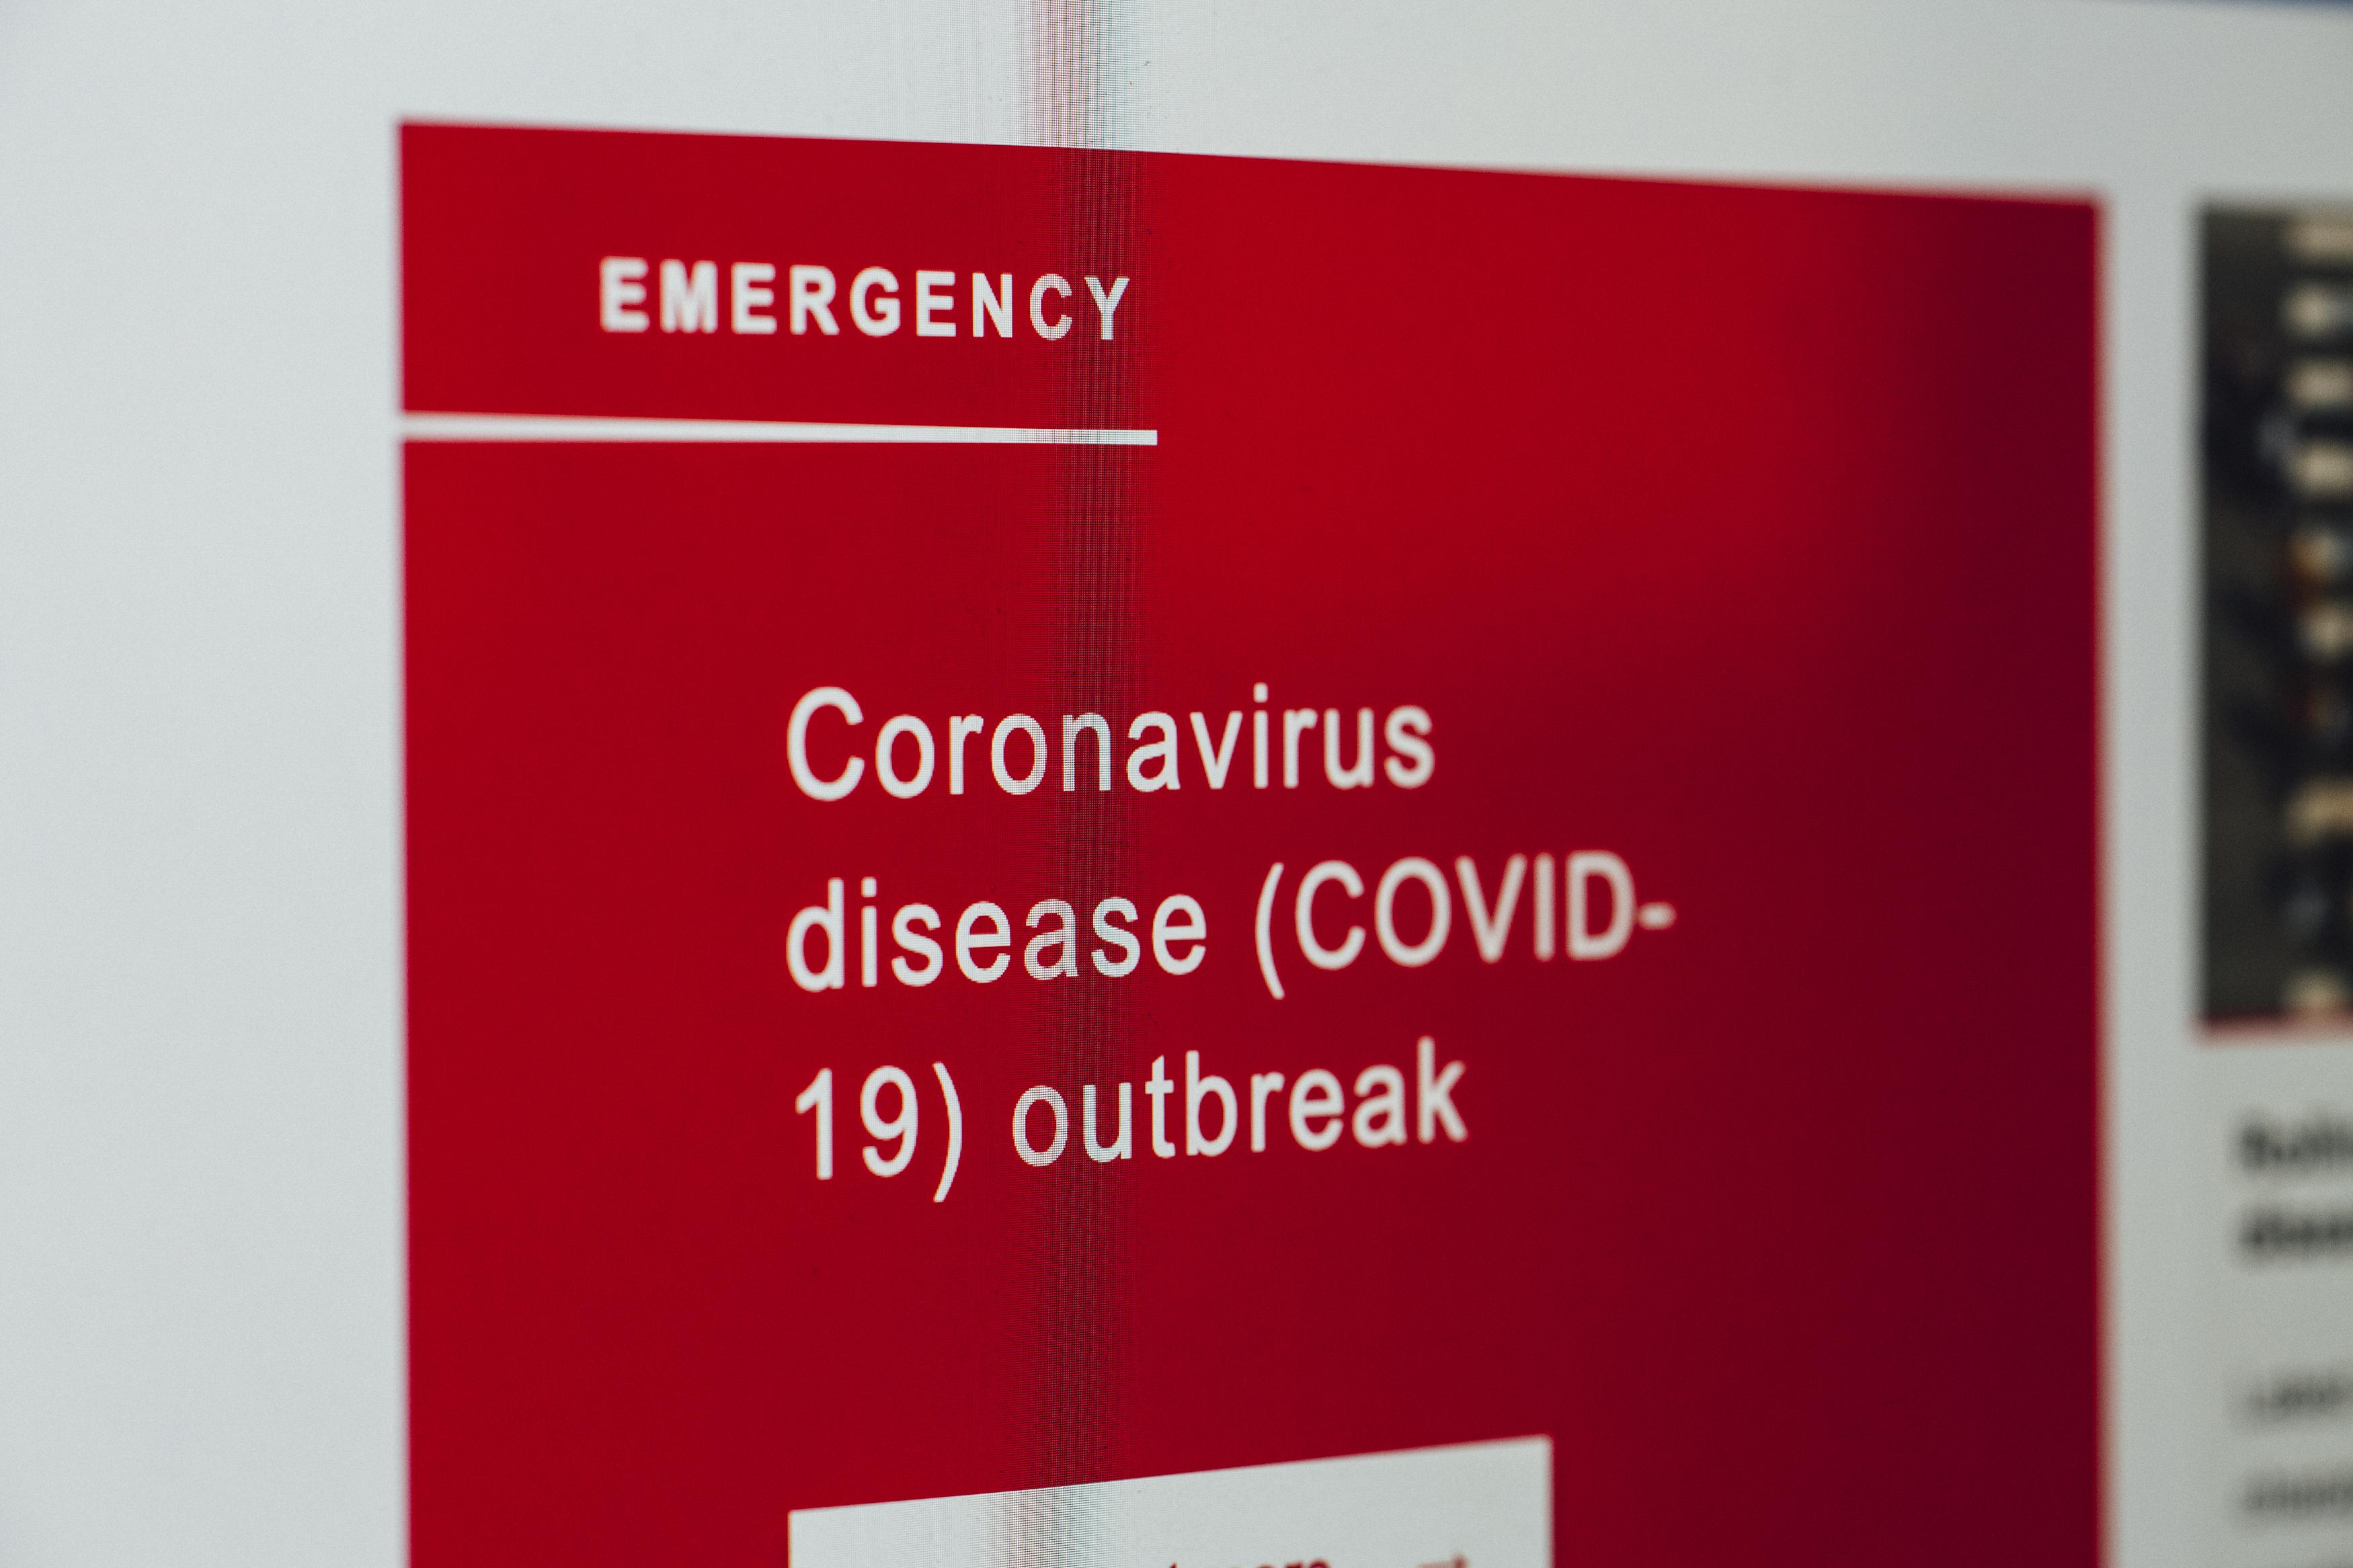 Coronavirus News on Screen - Hotcopy